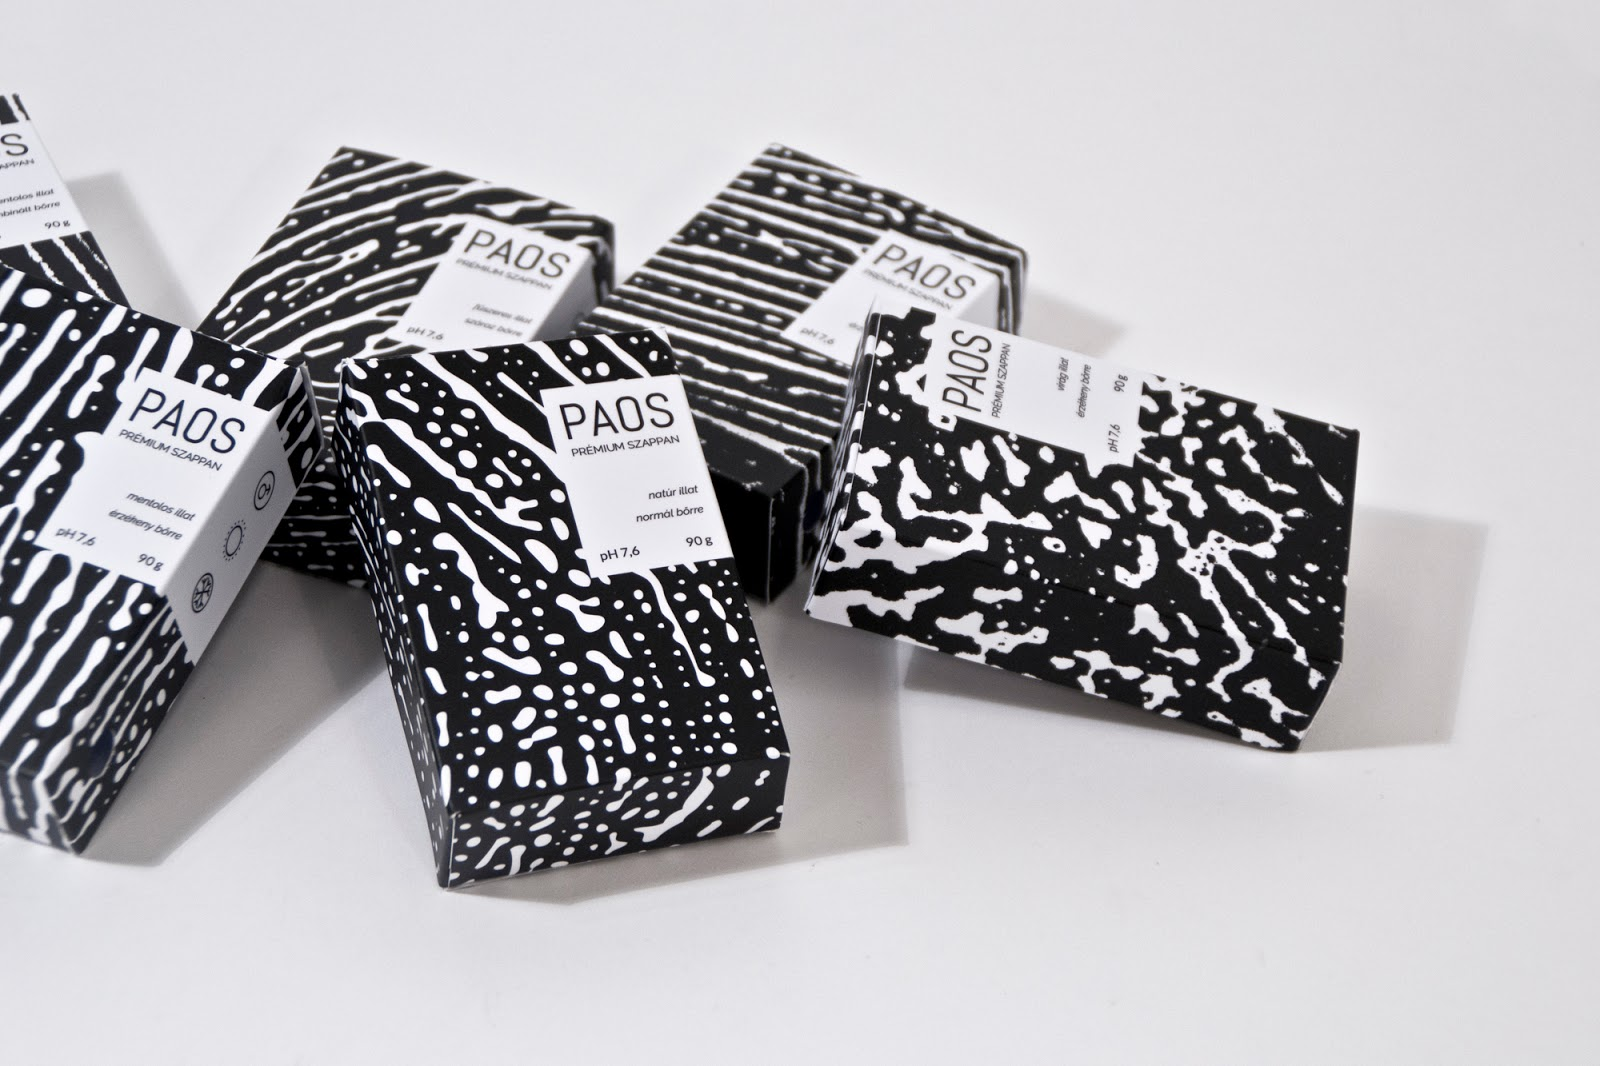 Thiết kế bao bì sản phẩm PAOS Premium Soap